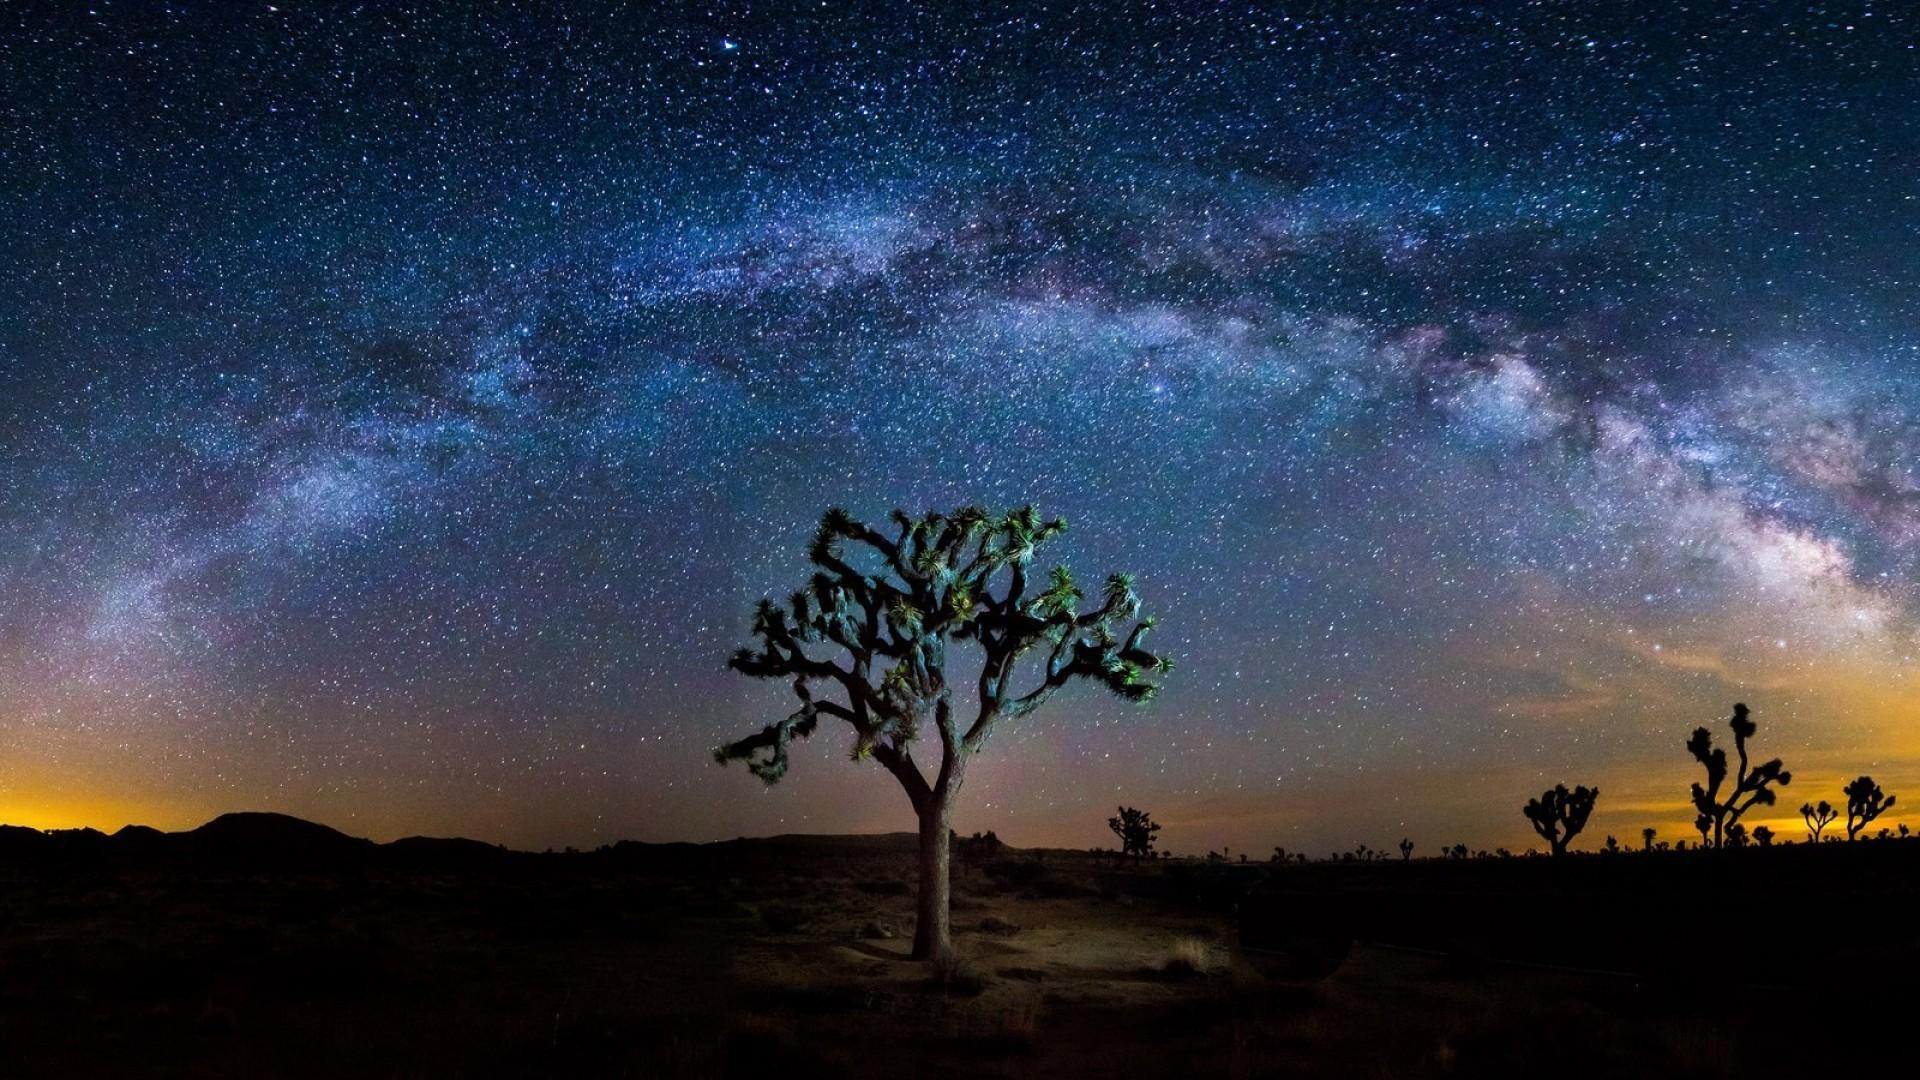 The-Milky-Way-Stargazing-in-California-Joshua-Tree-national-Park